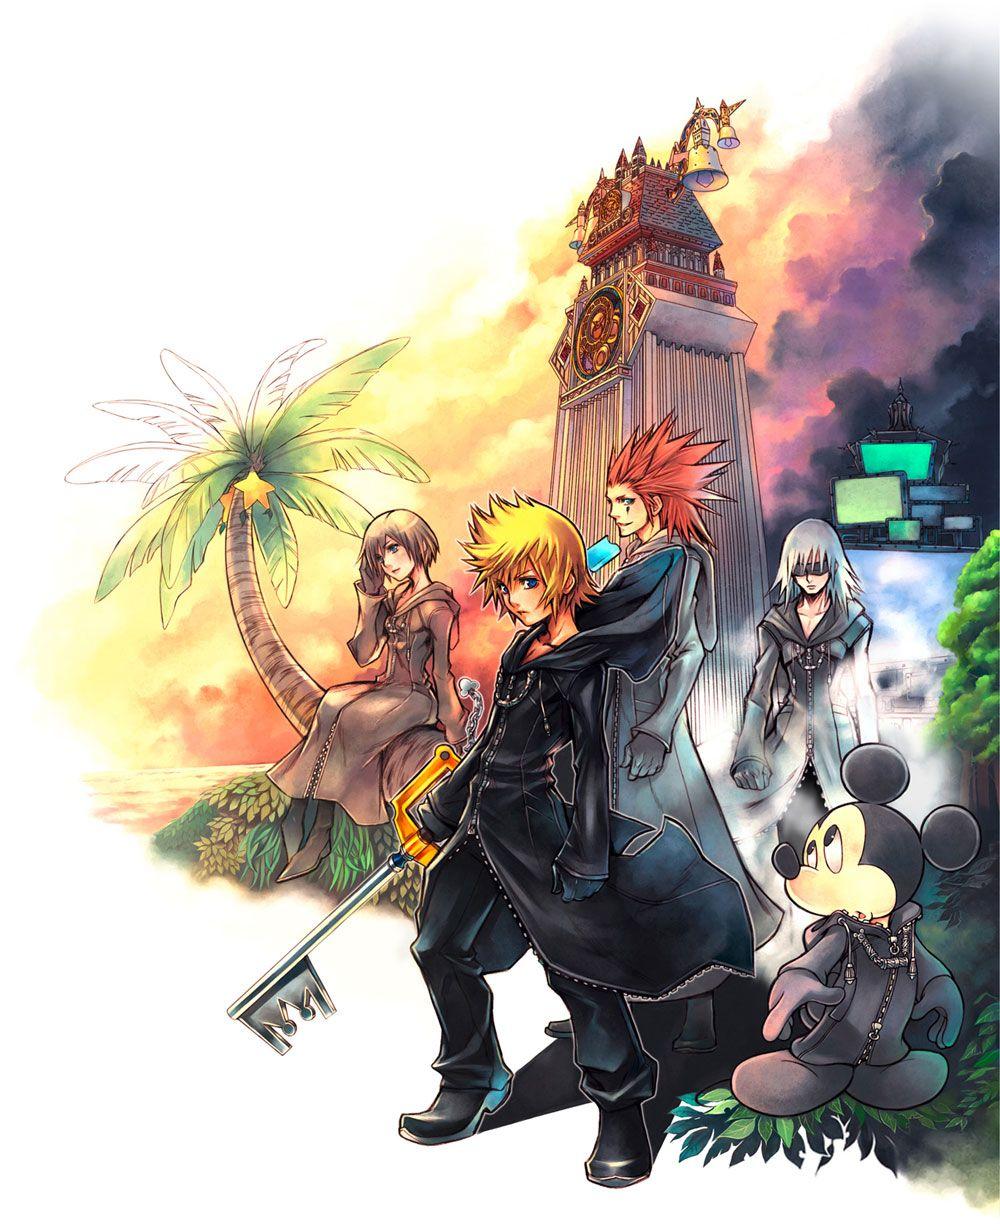 Kingdom Manga Next Release: Kingdom Hearts 358/2 Days - Main Illustration